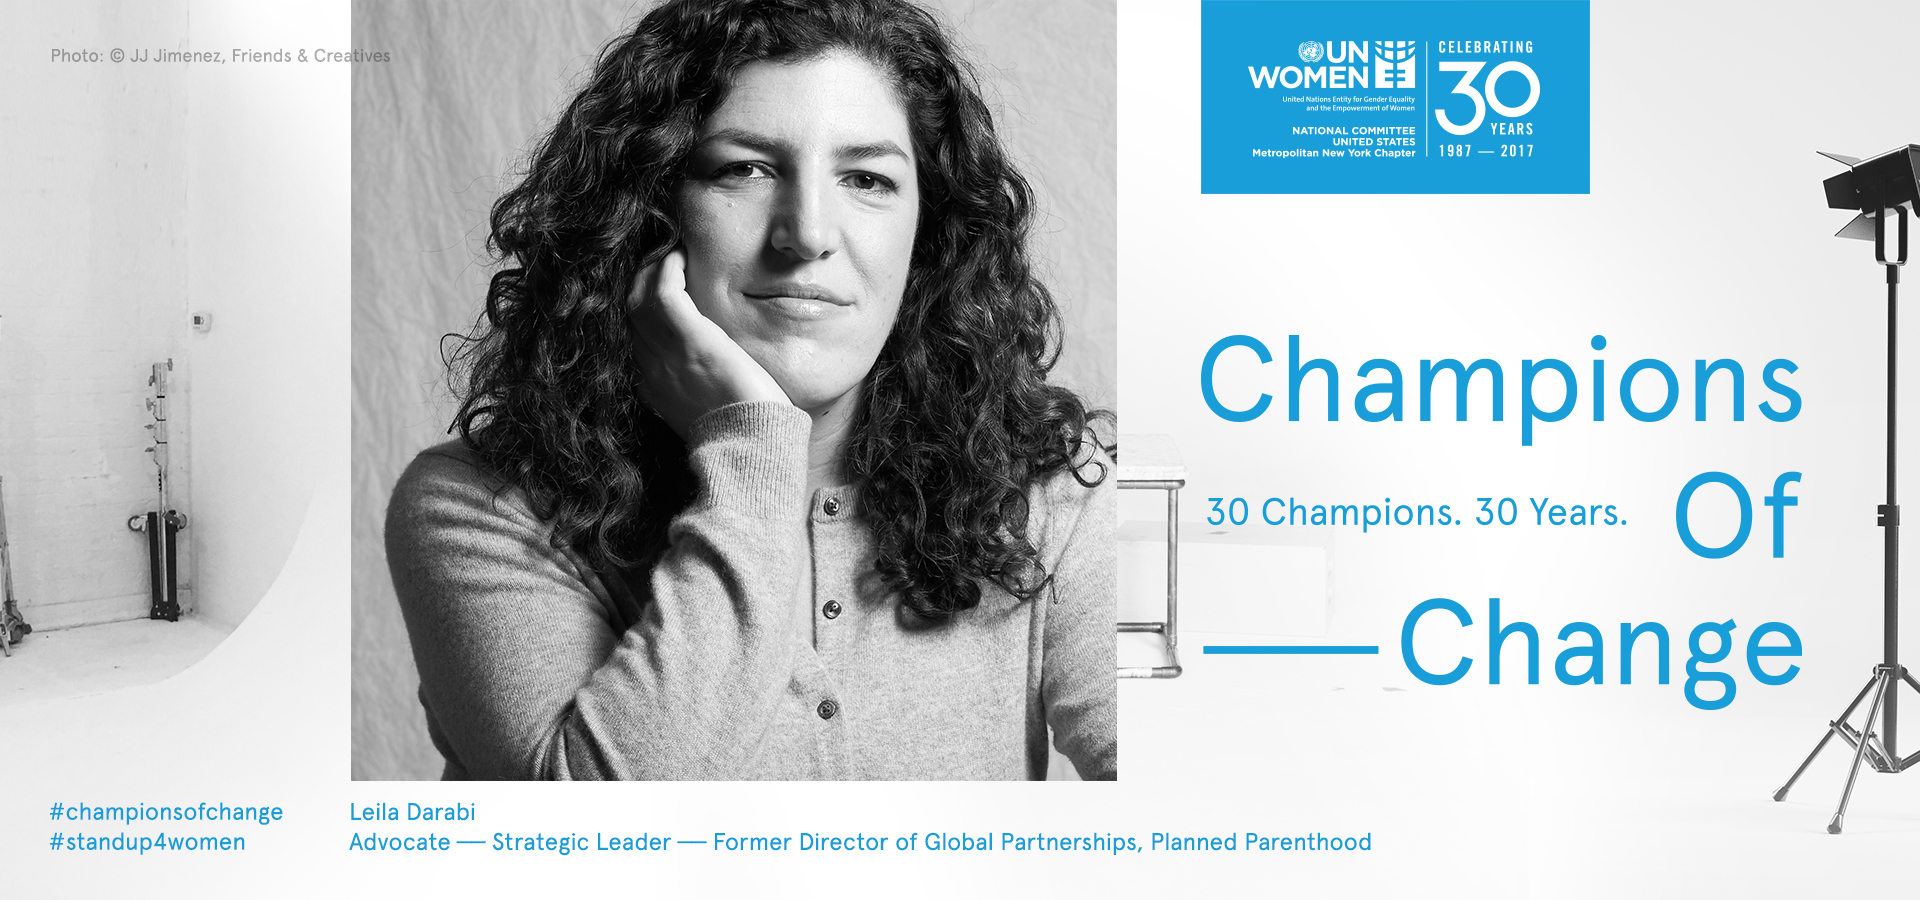 2018_UNWomen_ChampionsOfChange_Website_ProfilePage_LeilaDarabi.jpg